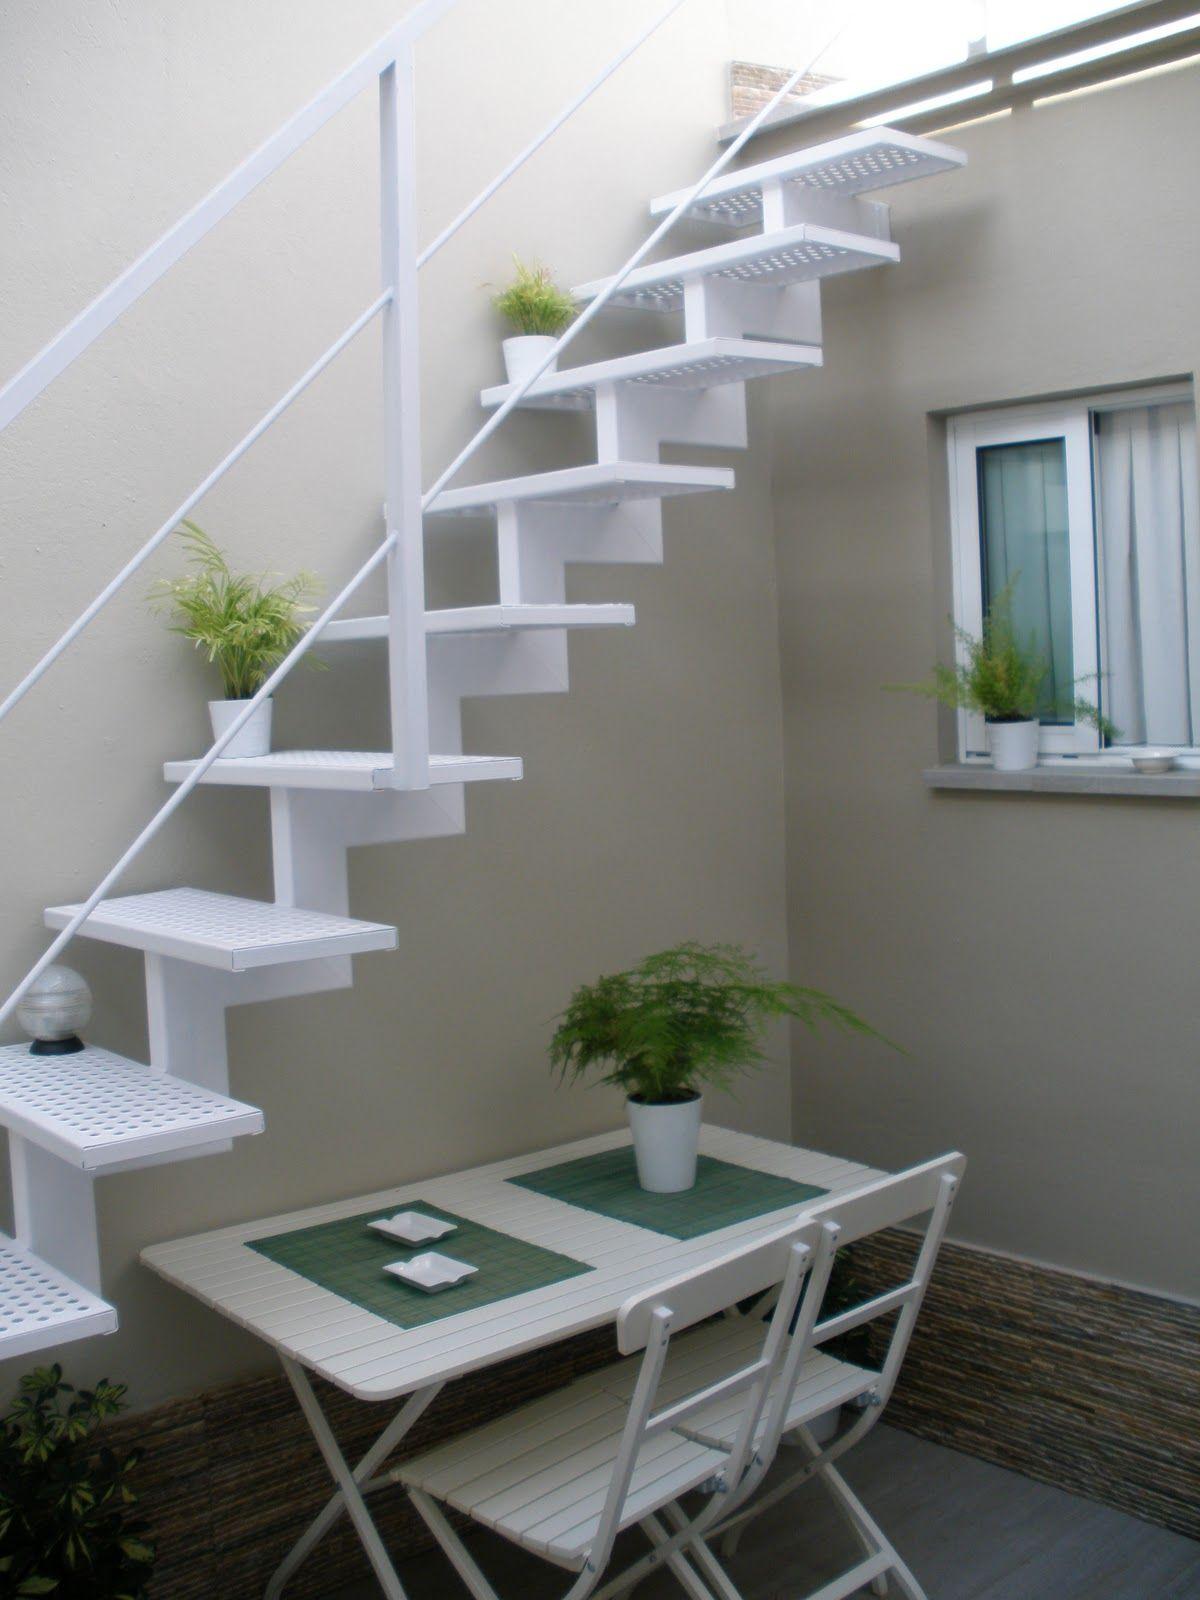 Escaleras ligeras arquitectura en 2019 pinterest for Jaula de la escalera de color idea